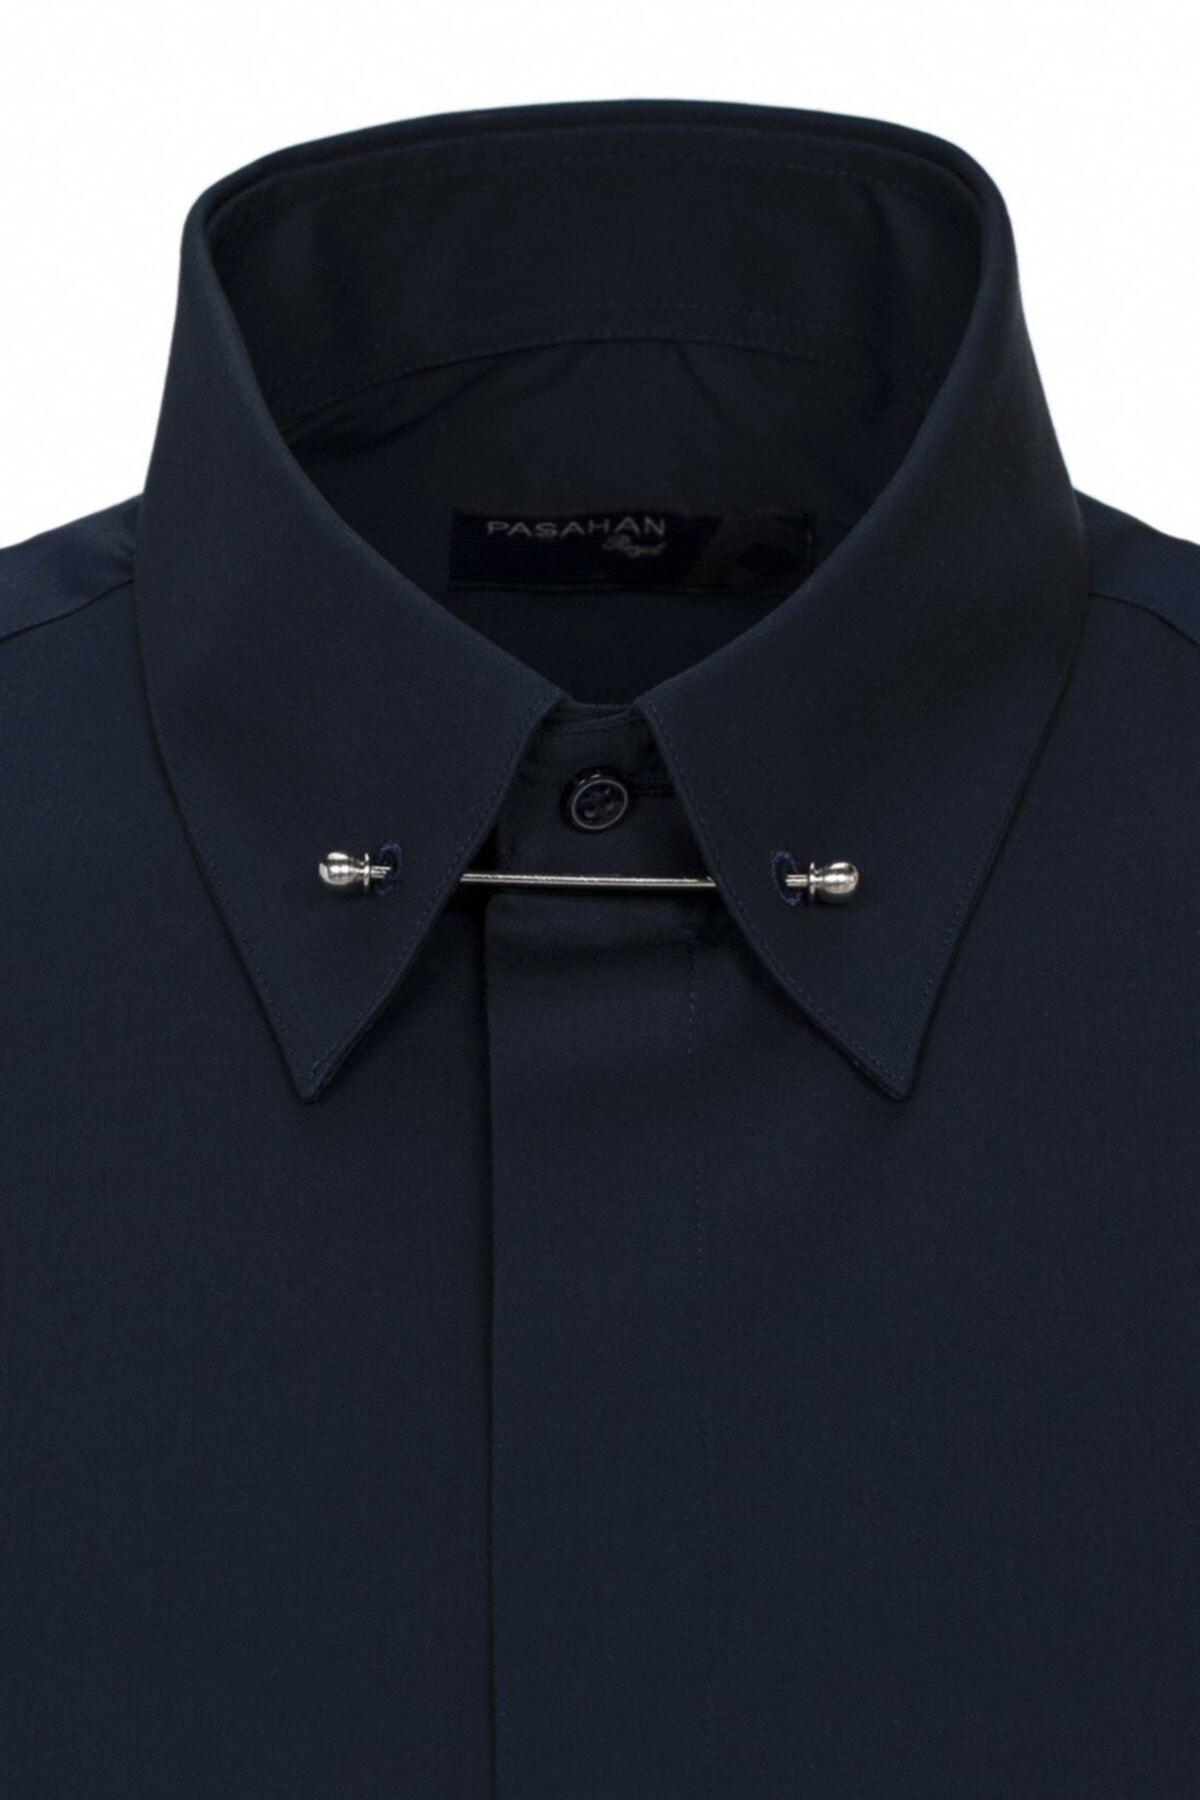 Paşahan Erkek Lacivert Slim Fit Yaka İğneli Gömlek 2